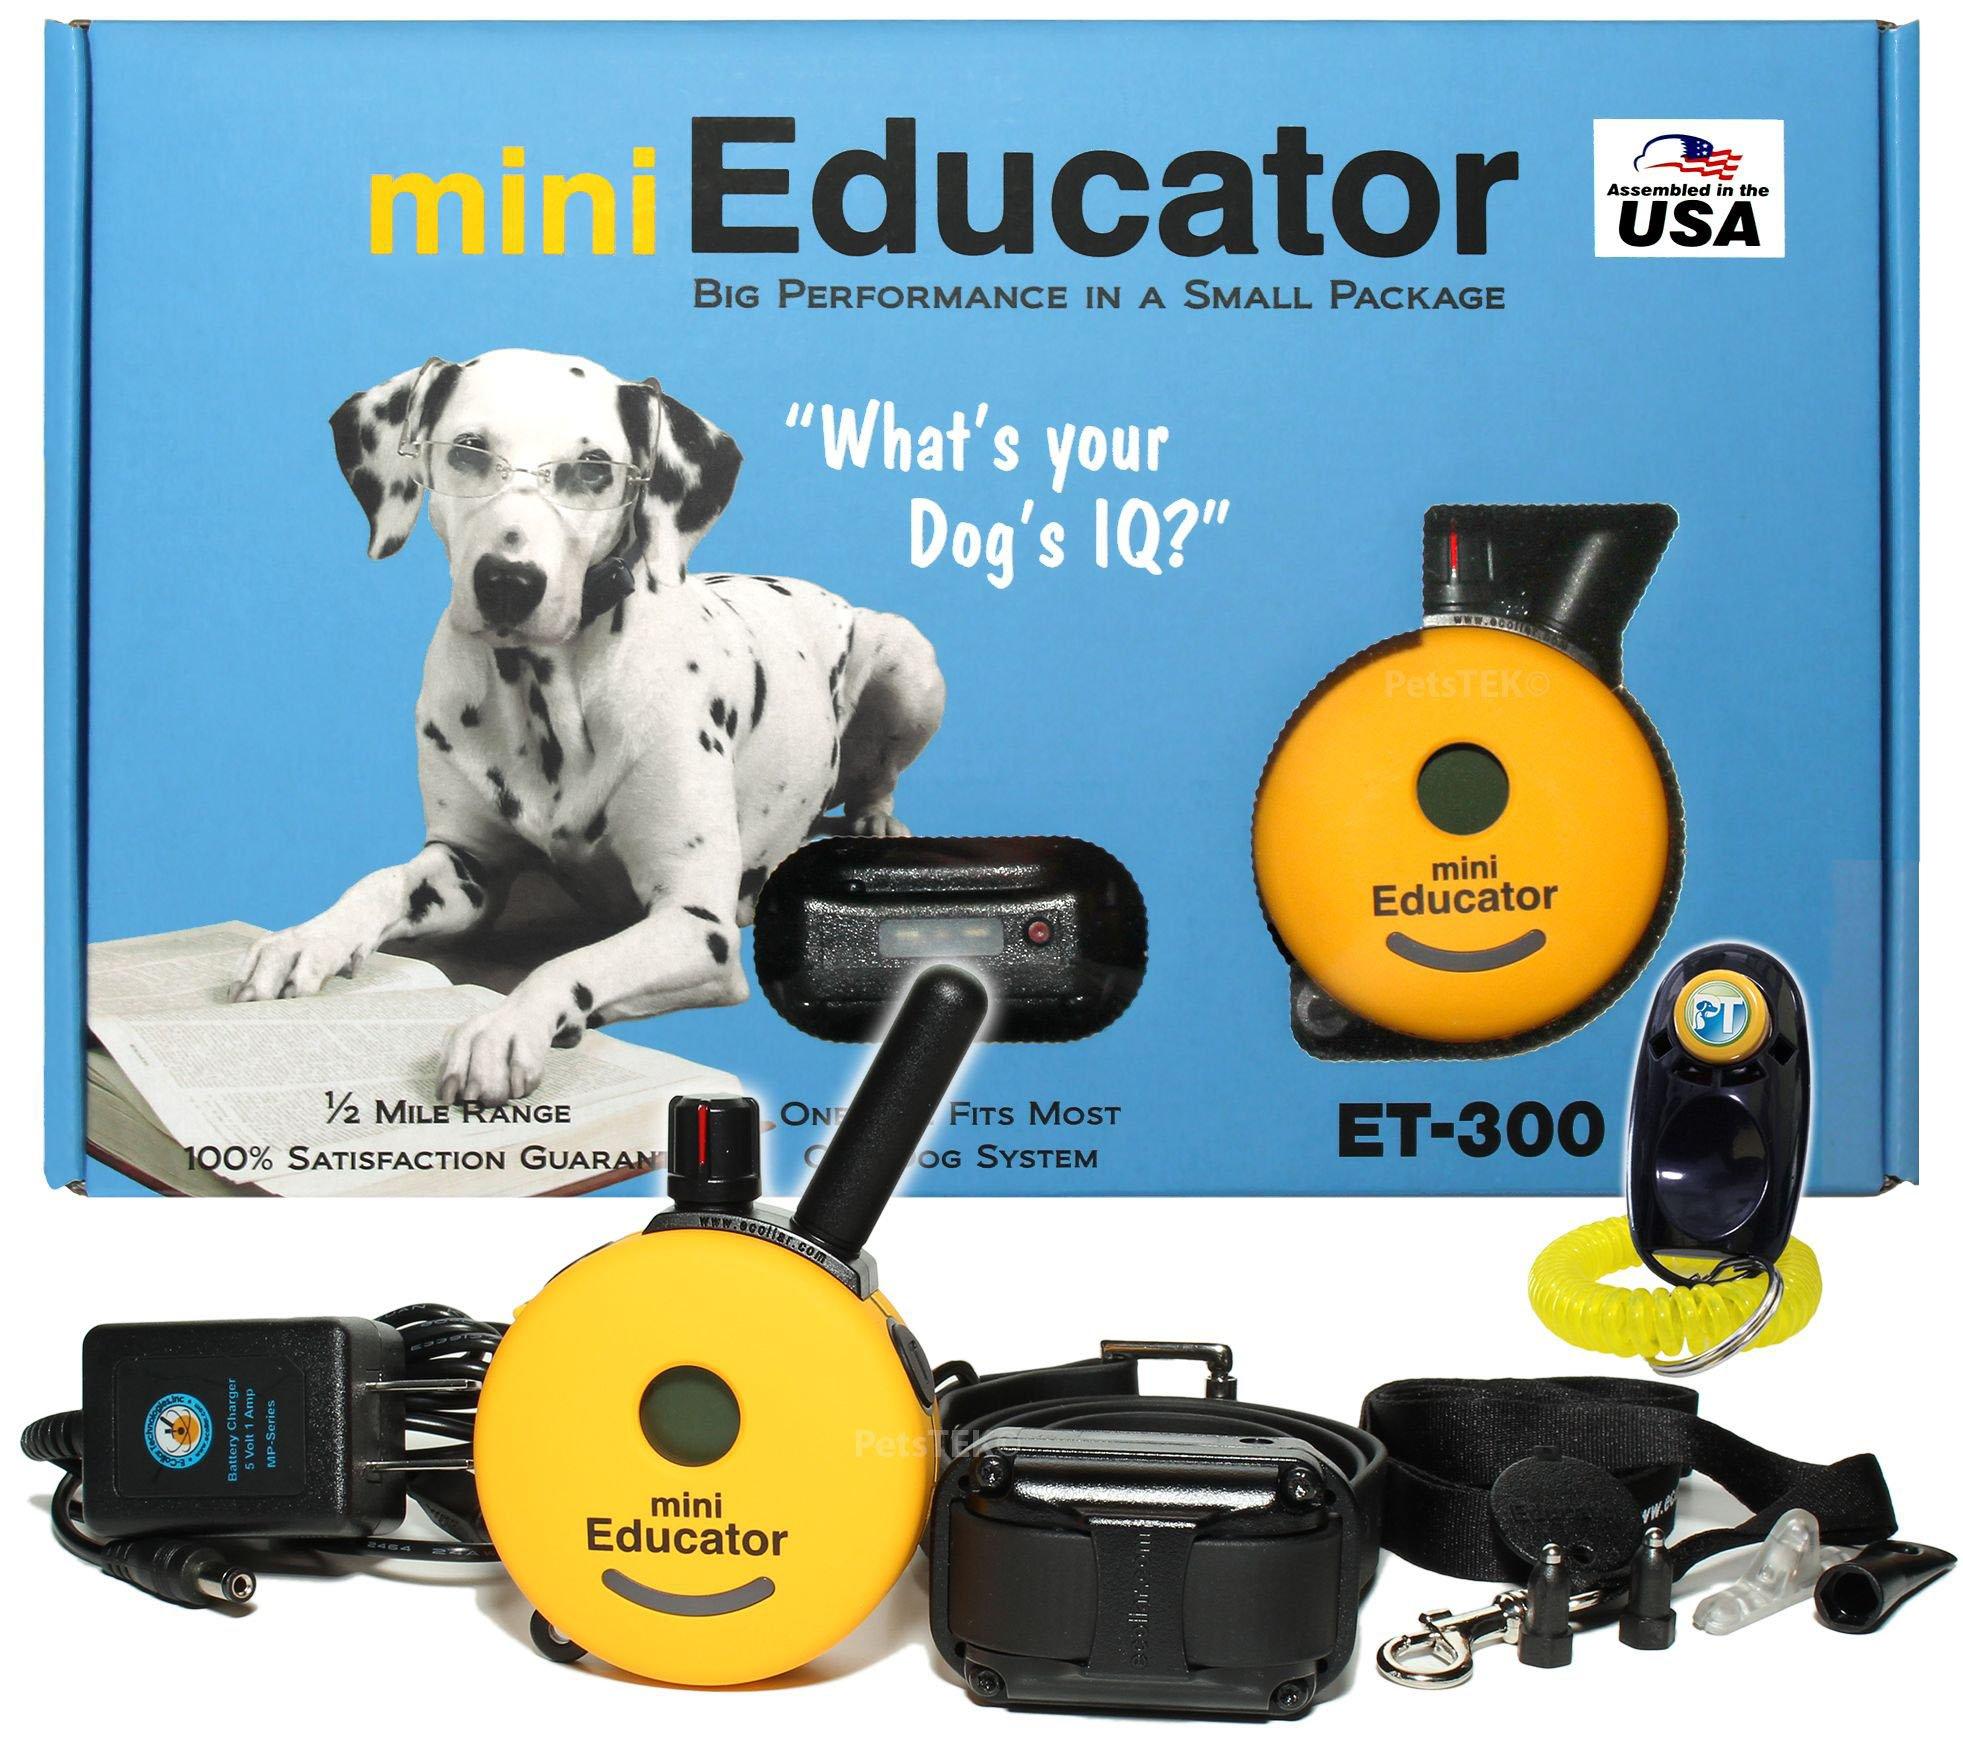 Bundle of 2 Items - E-Collar - ET-300 - 1/2 Mile Remote Waterproof Trainer Mini Educator - Static, Vibration and Sound Stimulation Collar With PetsTEK Dog Training Clicker Training Kit by Mini Educator